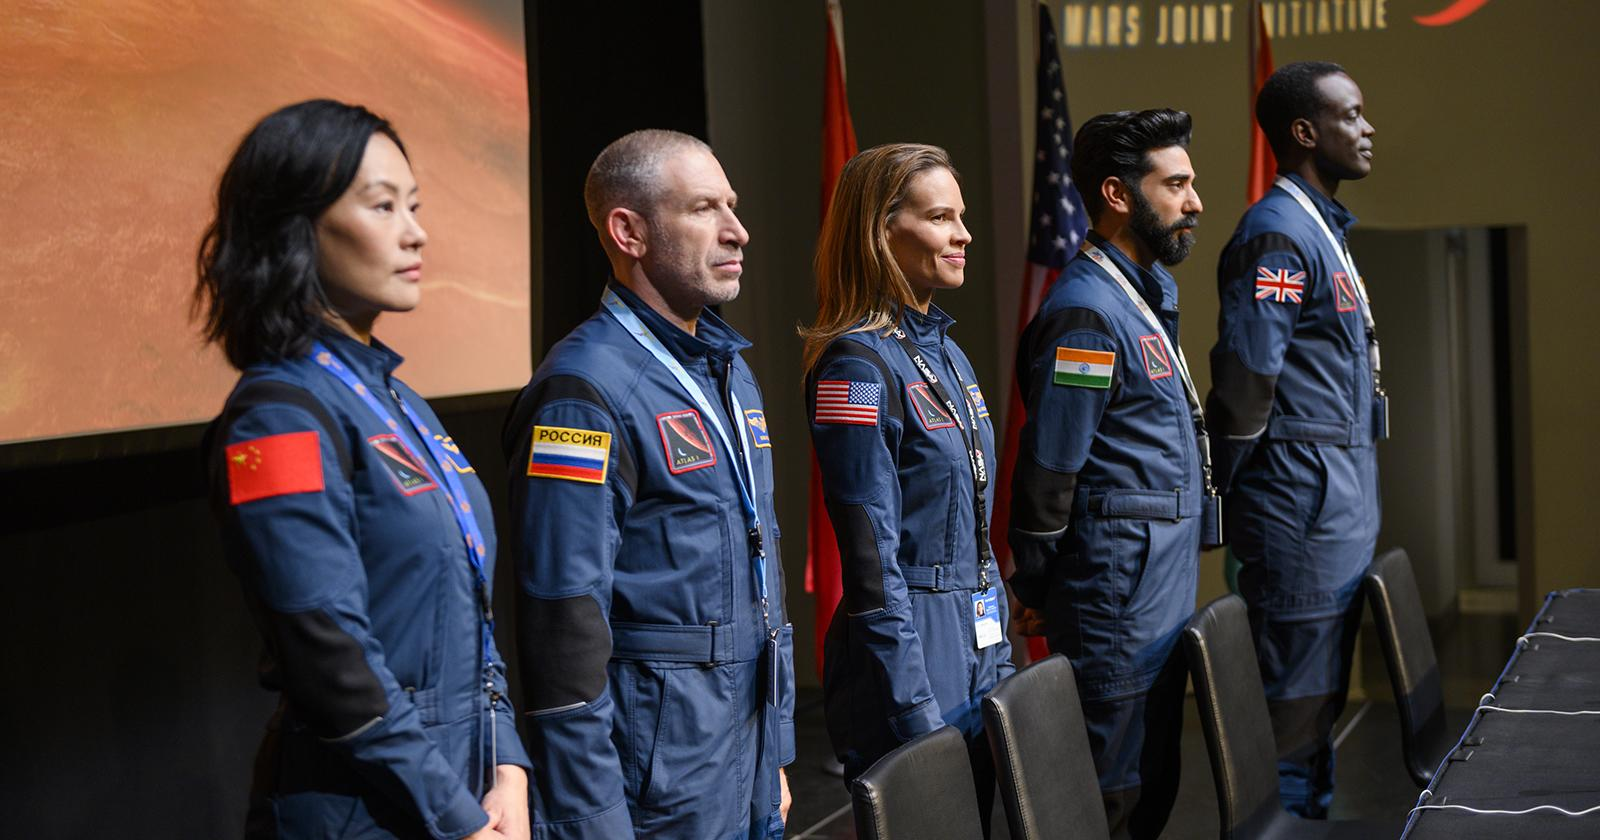 Lu (Vivian Wu), Misha (Mark Ivanir), Emma (Hilary Swank), , Ram (Ray Panthaki) y Kwesi (Ato Essandoh).